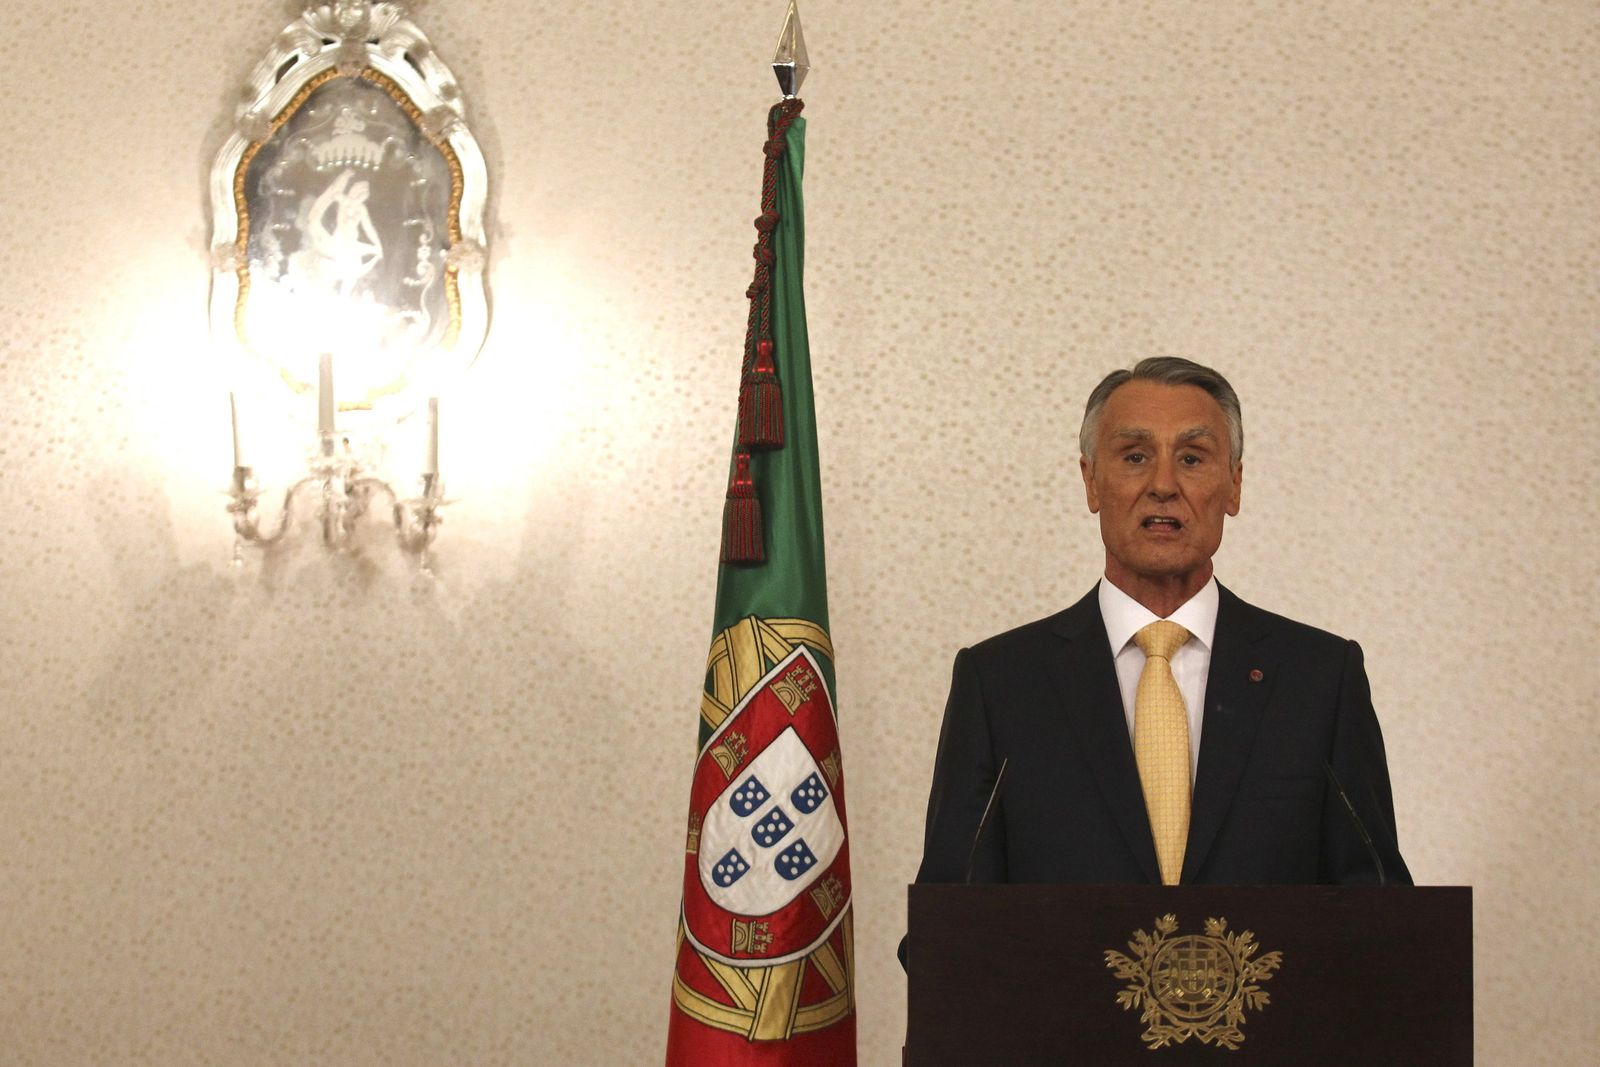 Portugal/Anibal Cavaco Silva